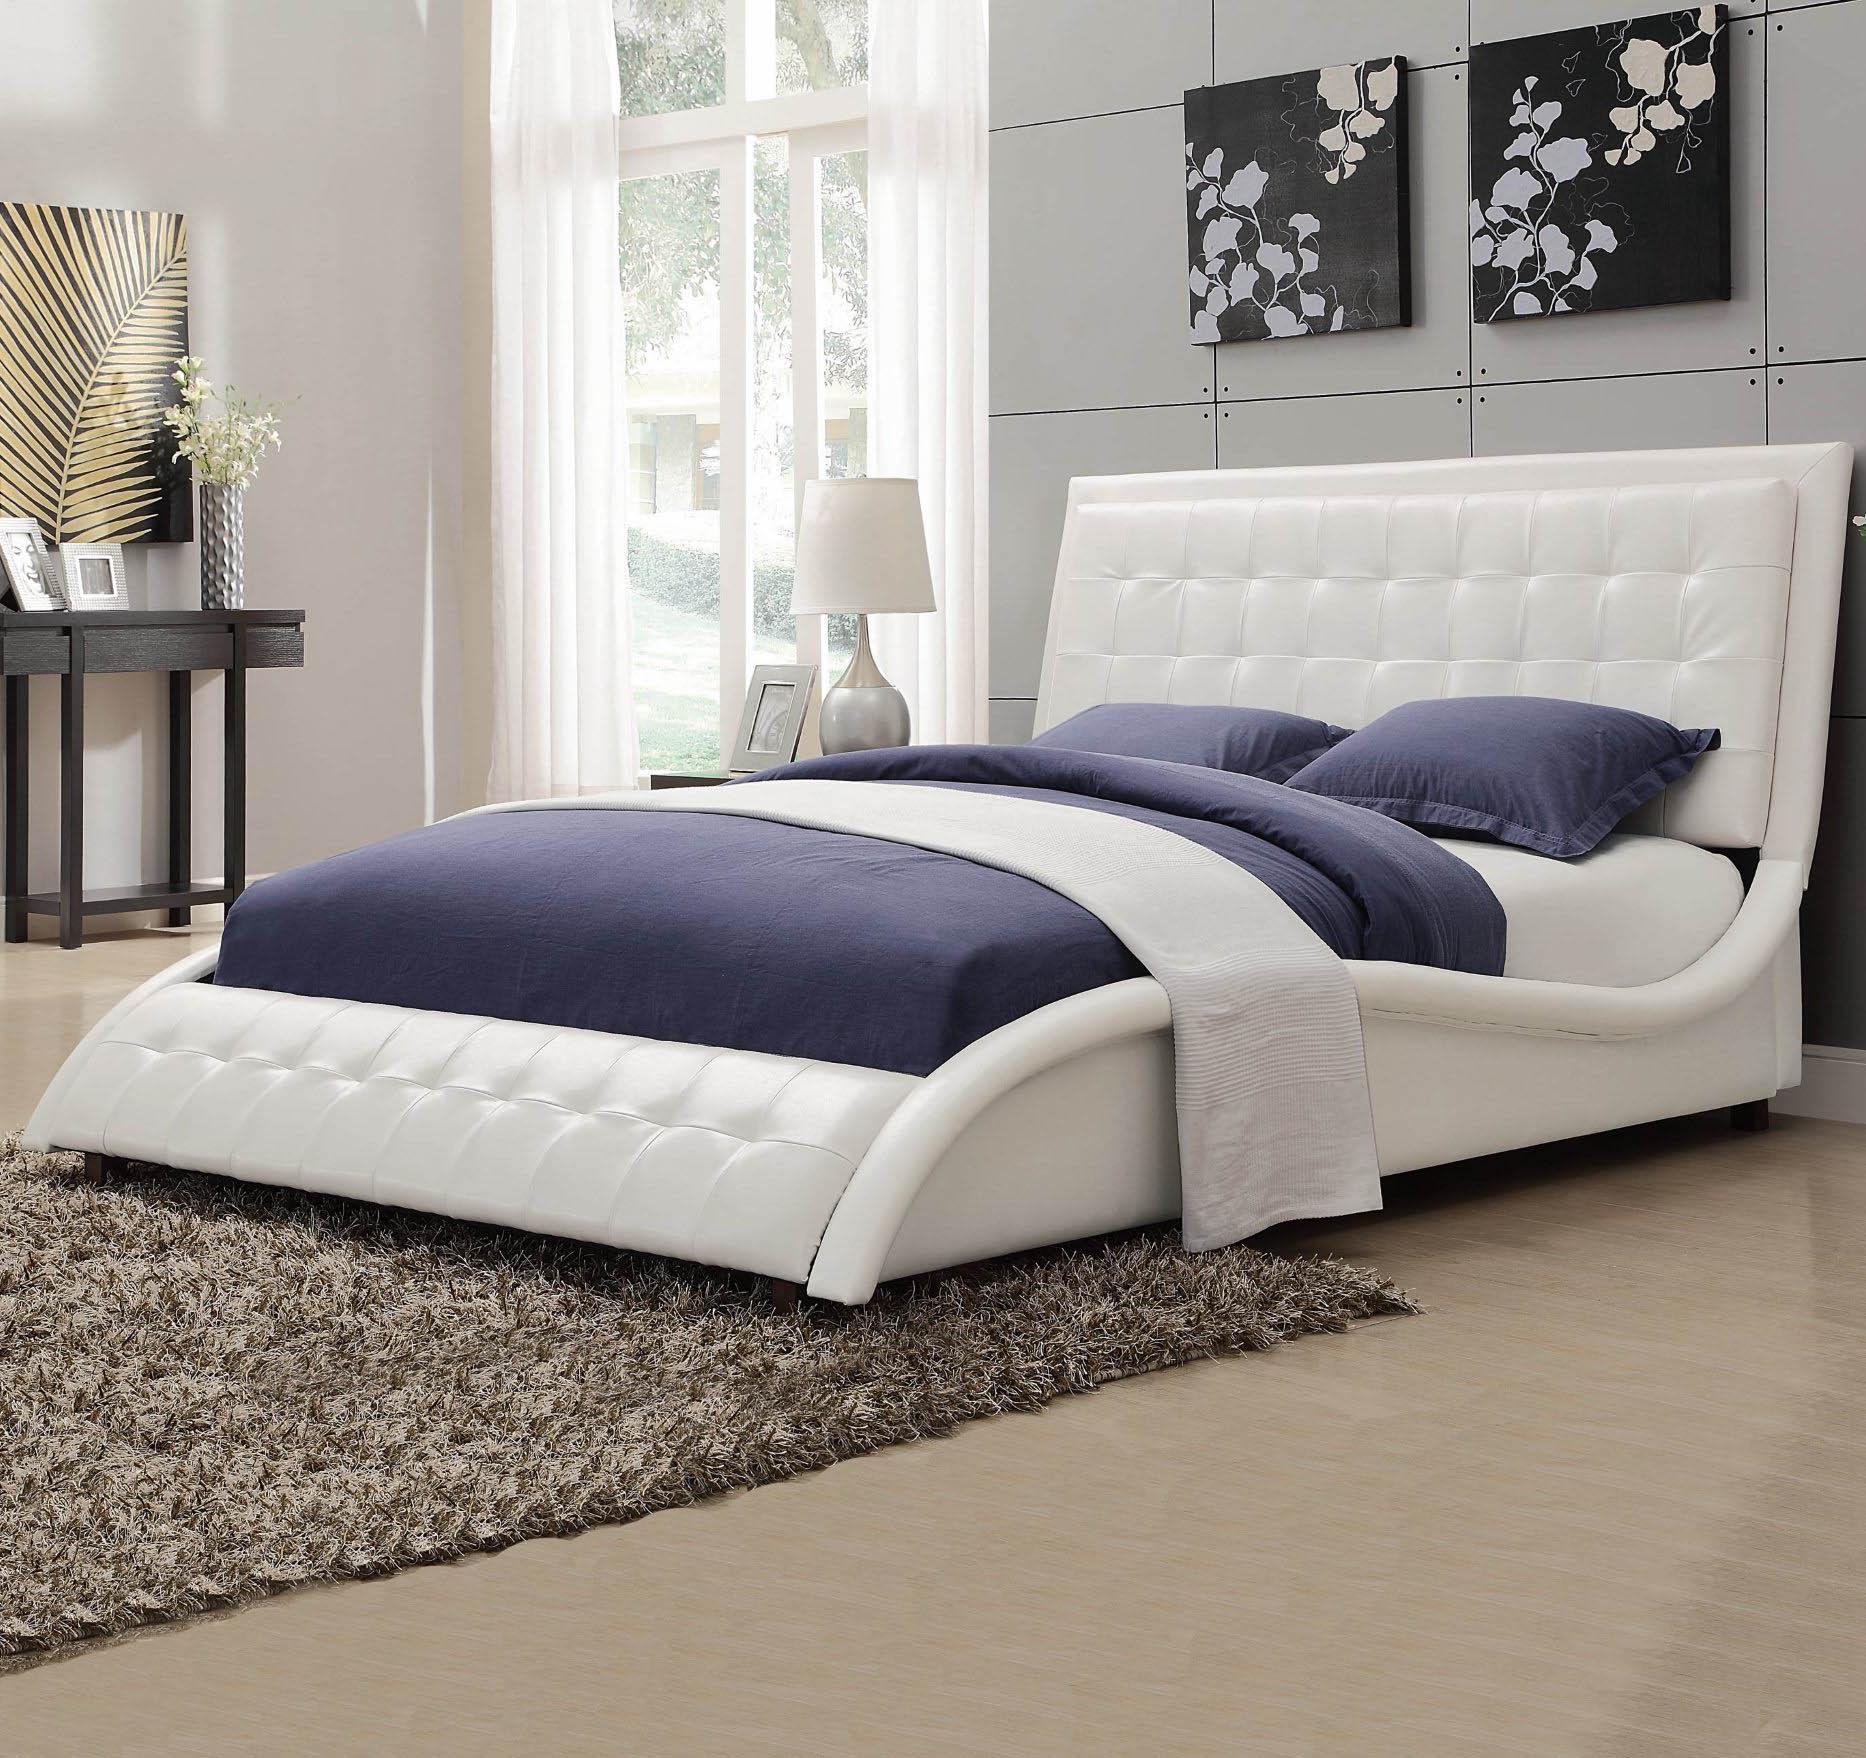 coaster tully upholstered king bed del sol furniture upholstered beds